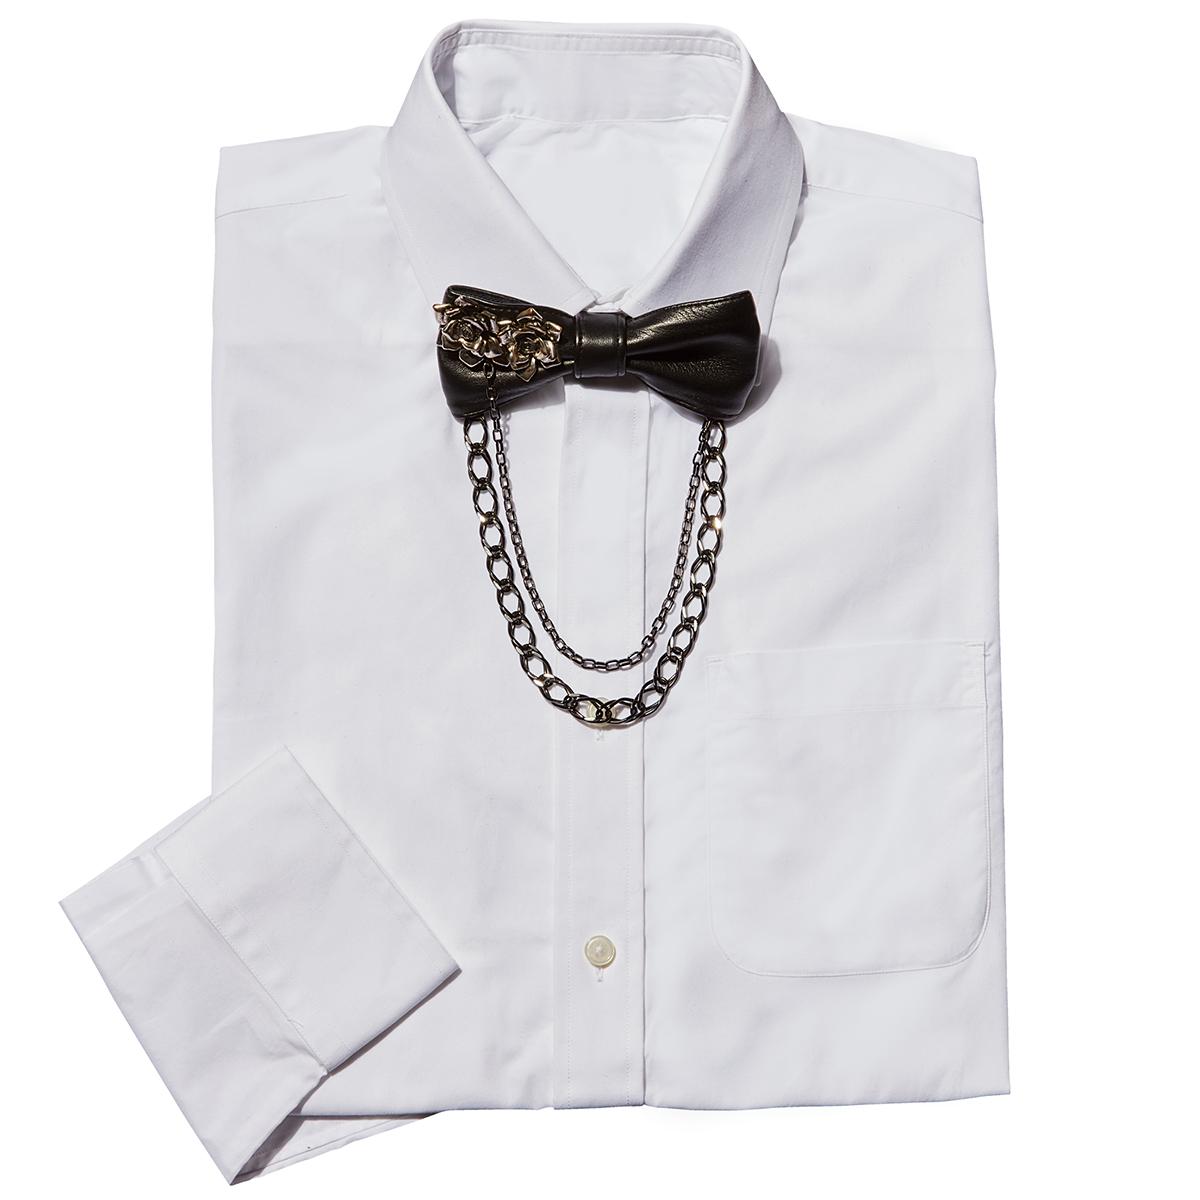 christopher chaun finale ii bow tie